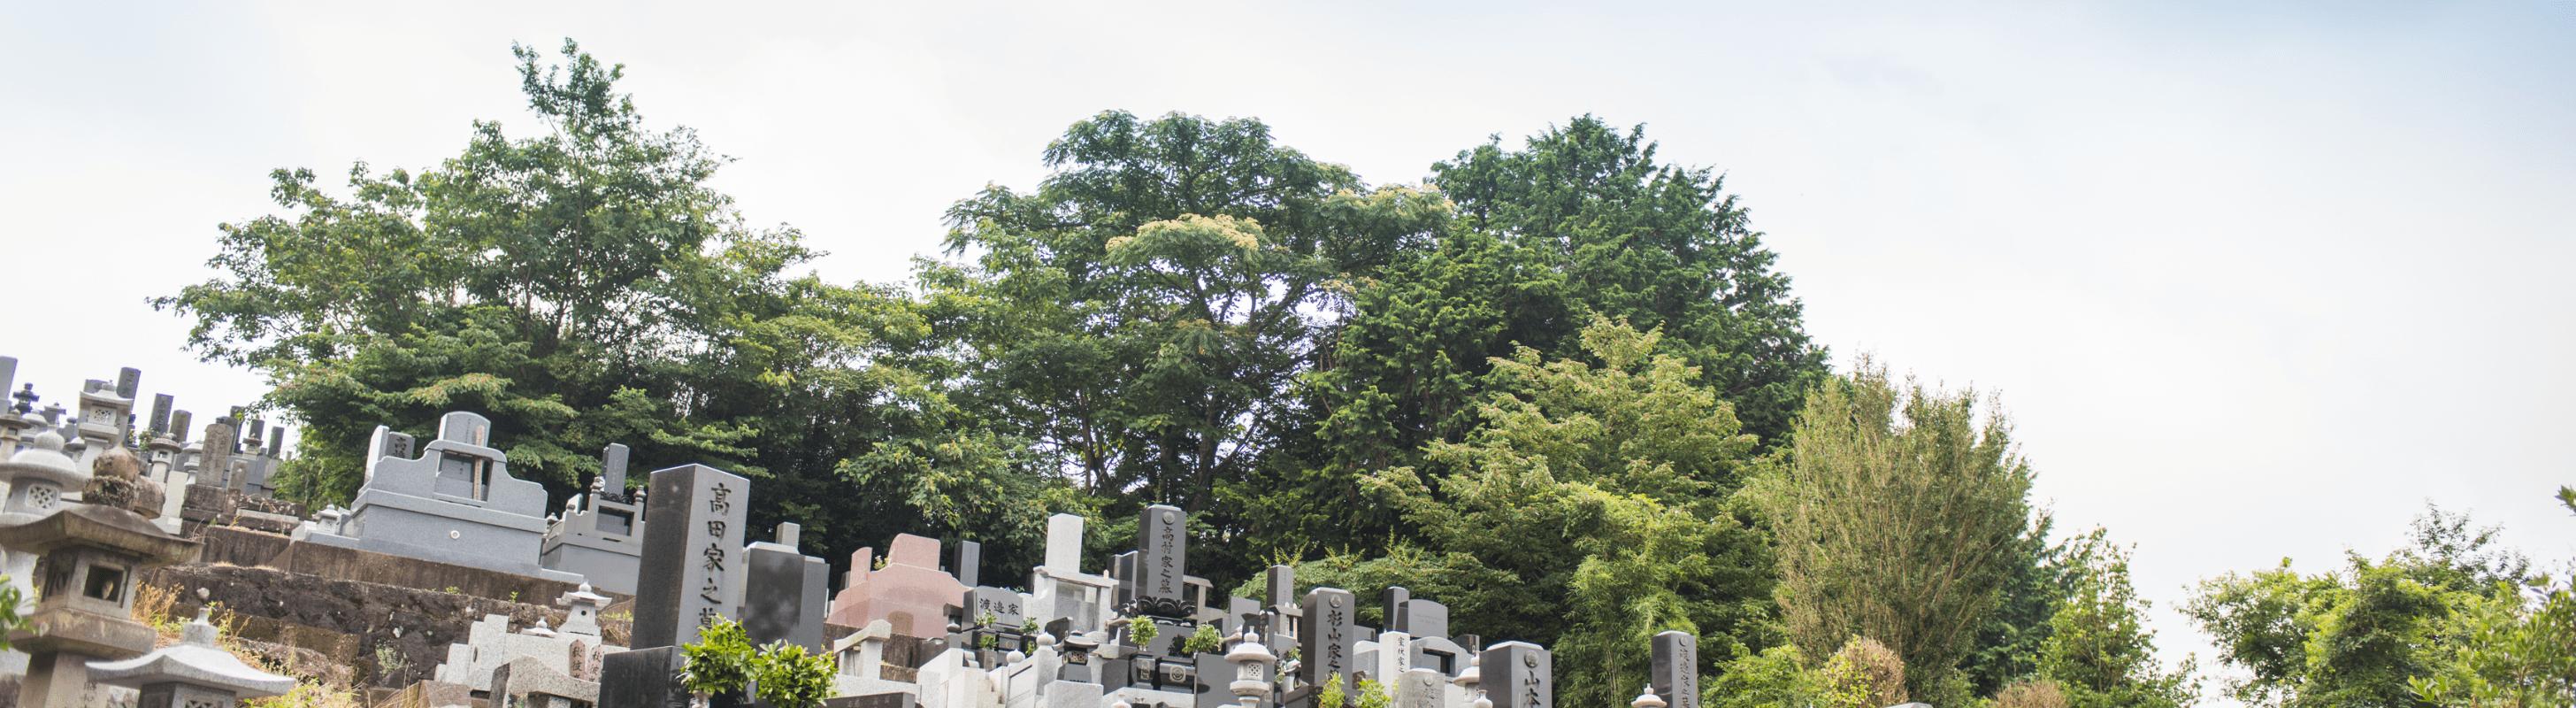 裾野光明寺の墓地